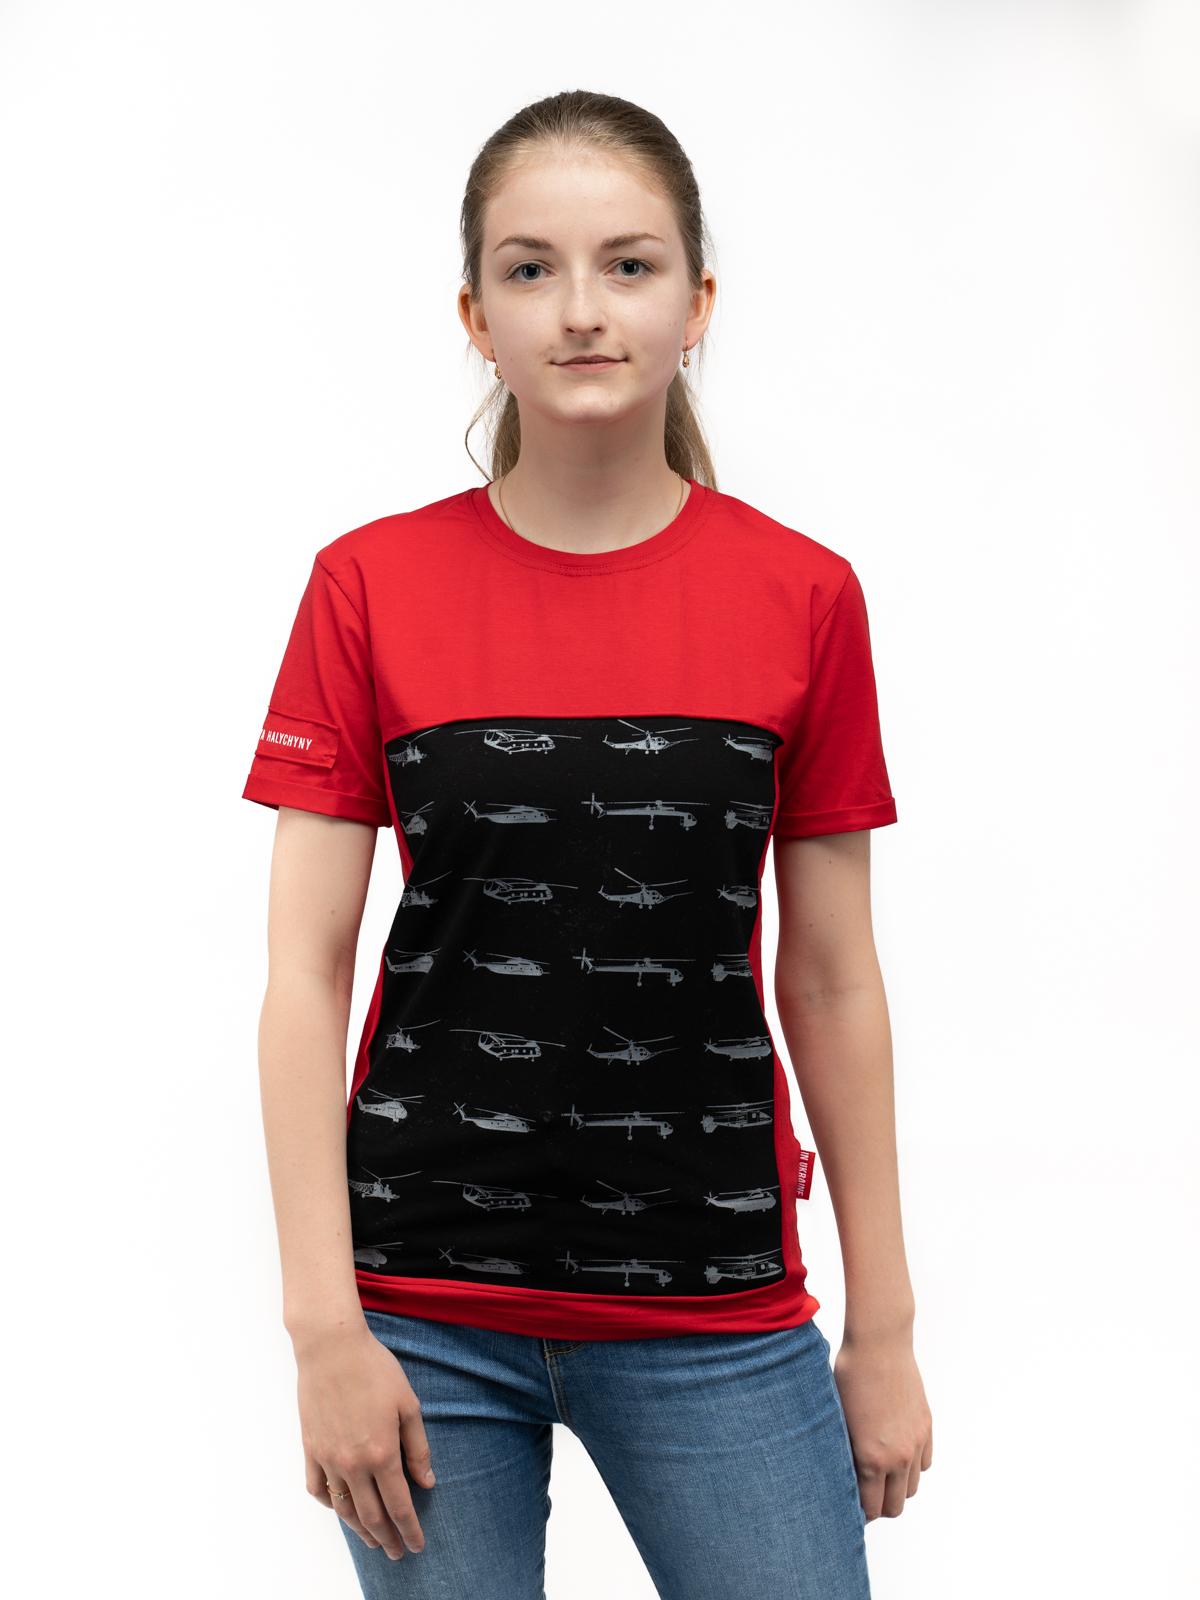 Women's T-Shirt Sikorsky. Color red. Unisex T-shirt (men's sizes).